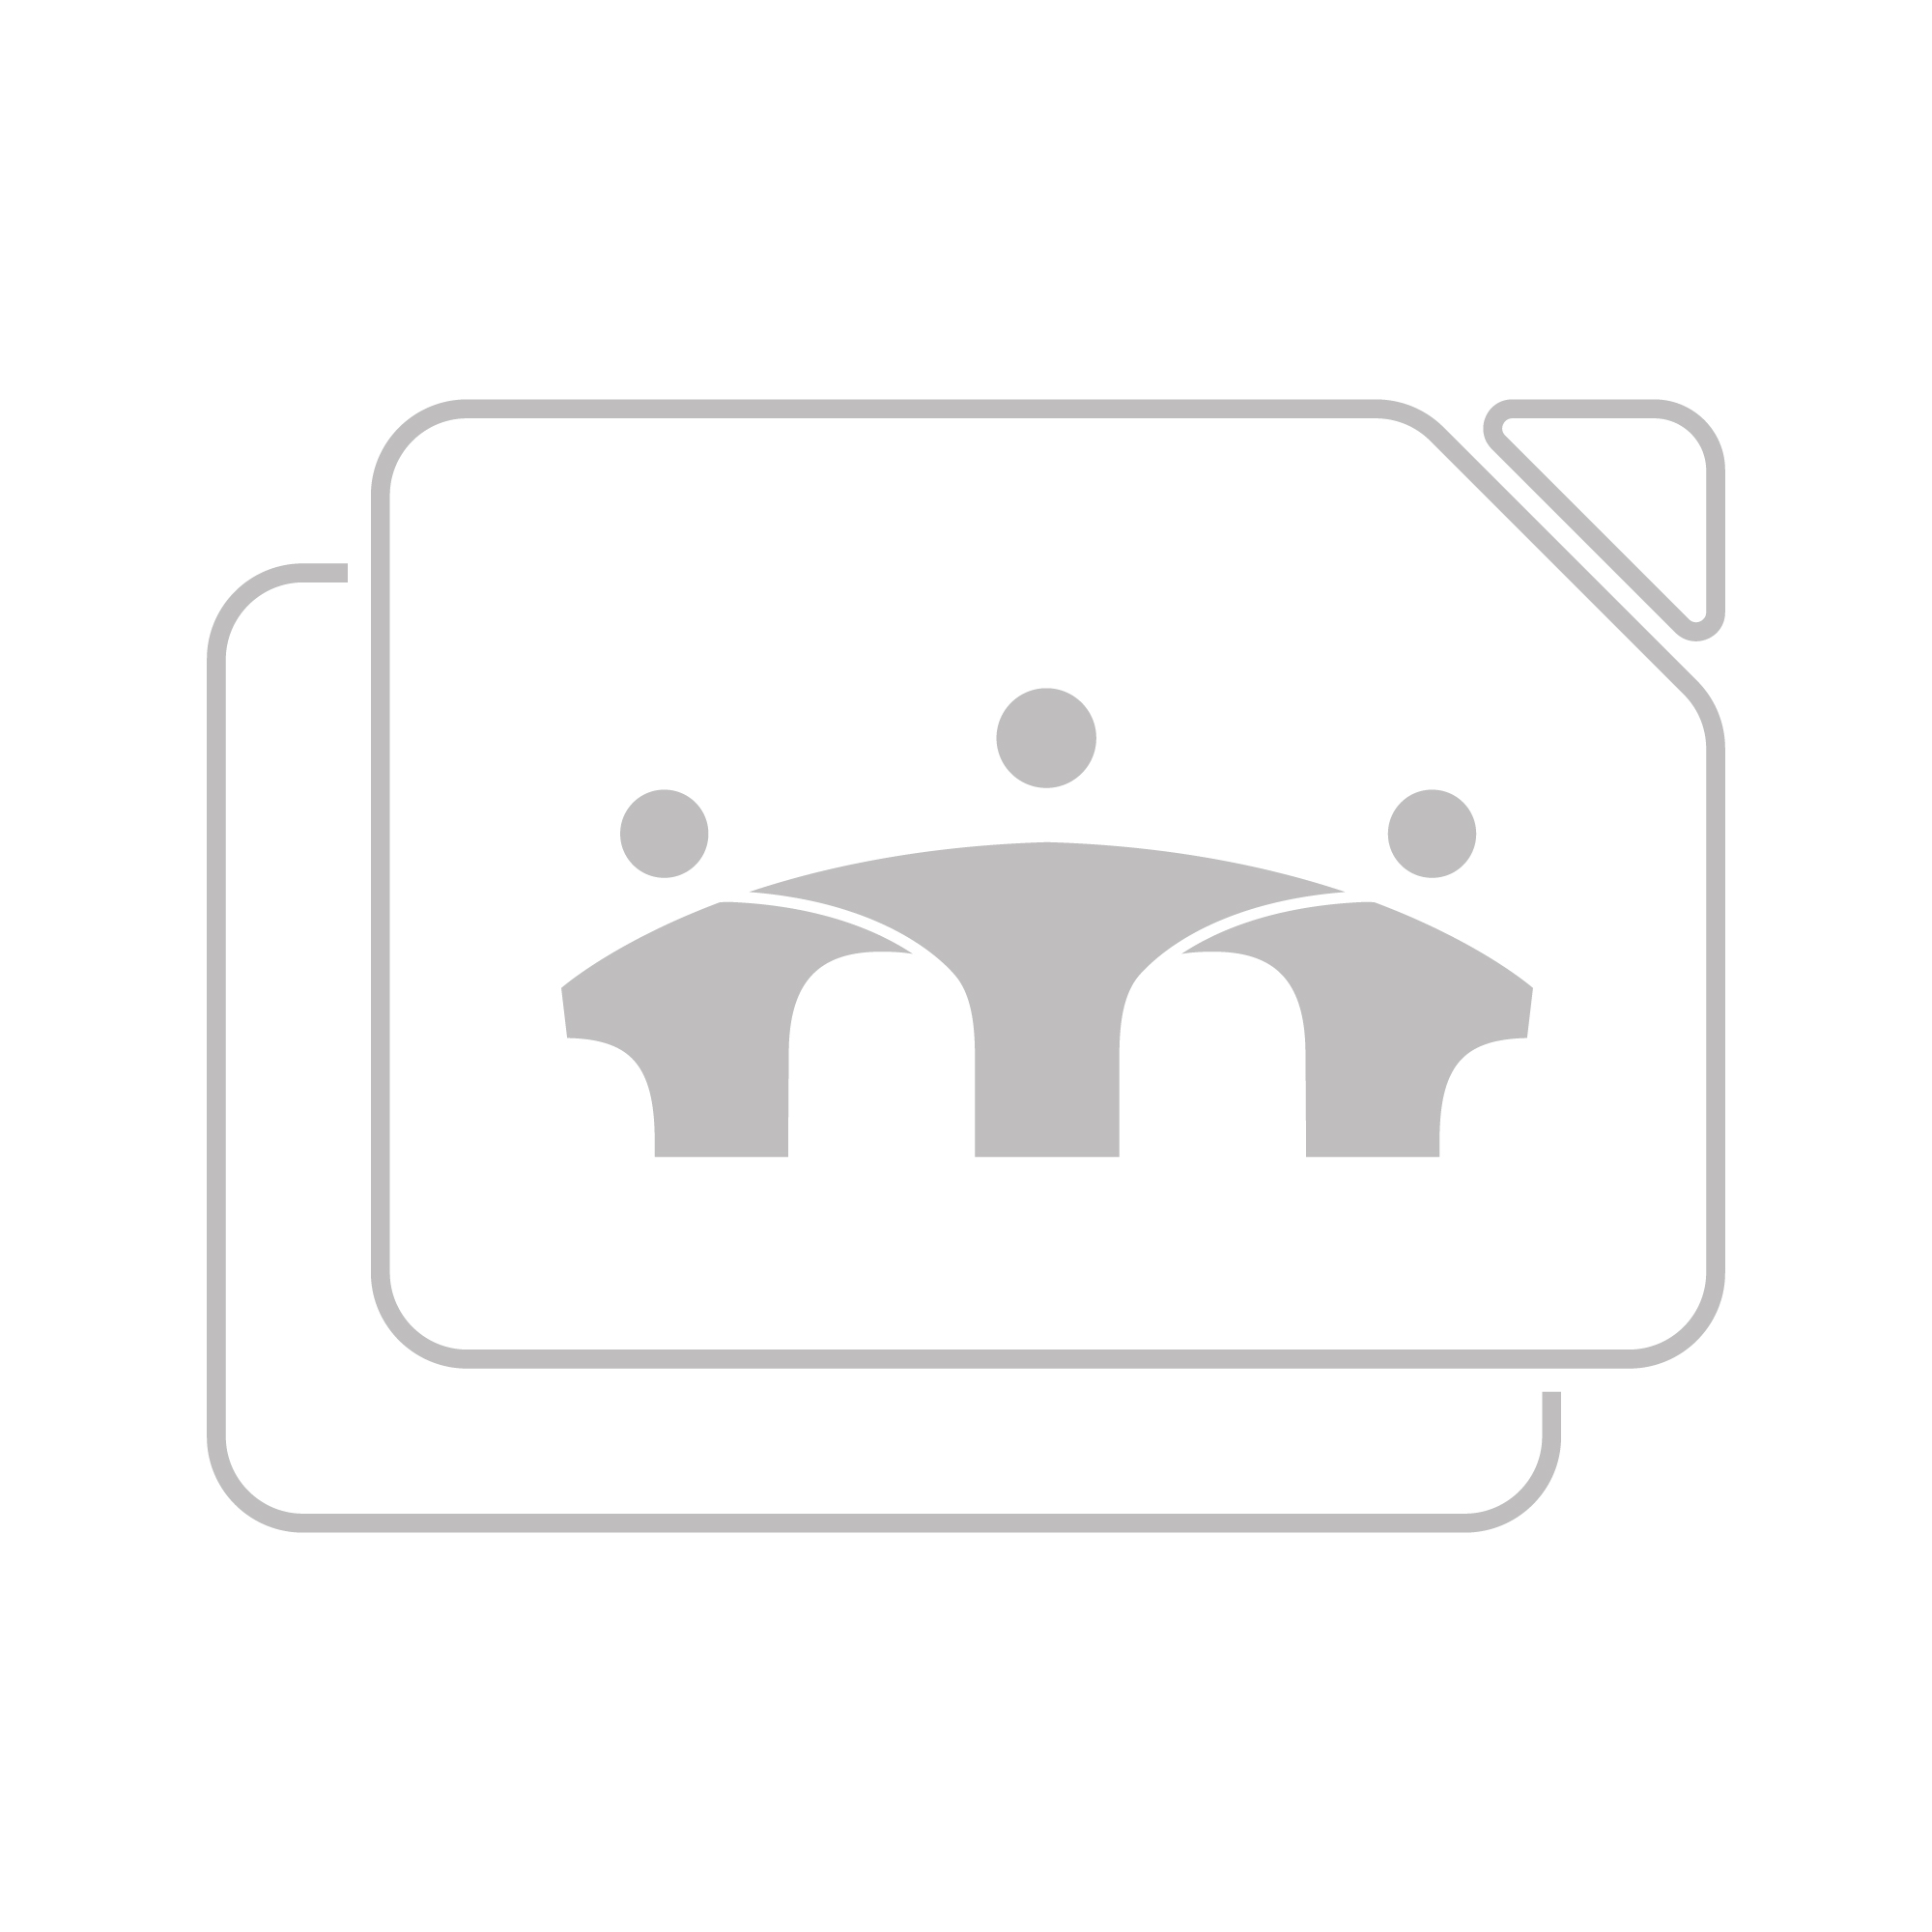 Kingston microSDXC Industrial 64GB C10 A1 pSLC Card + SD Adapter